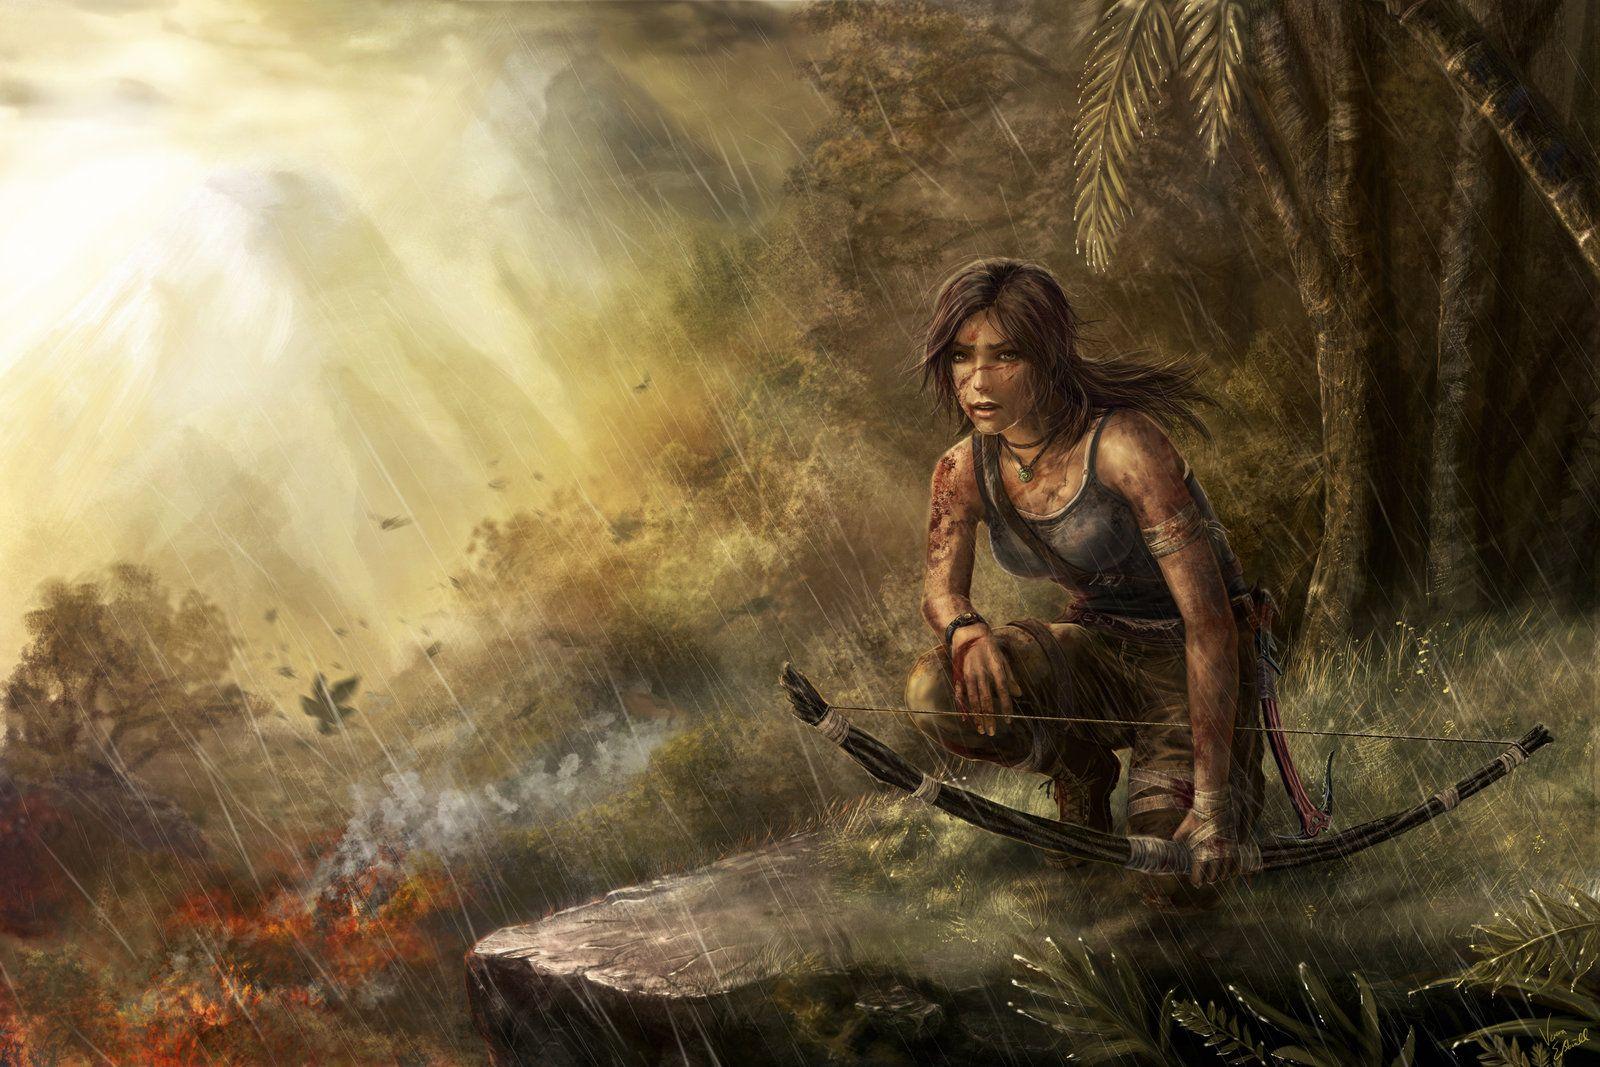 Pin by .1TRH1. on Lara Croft   Lara croft, Lara, Christian